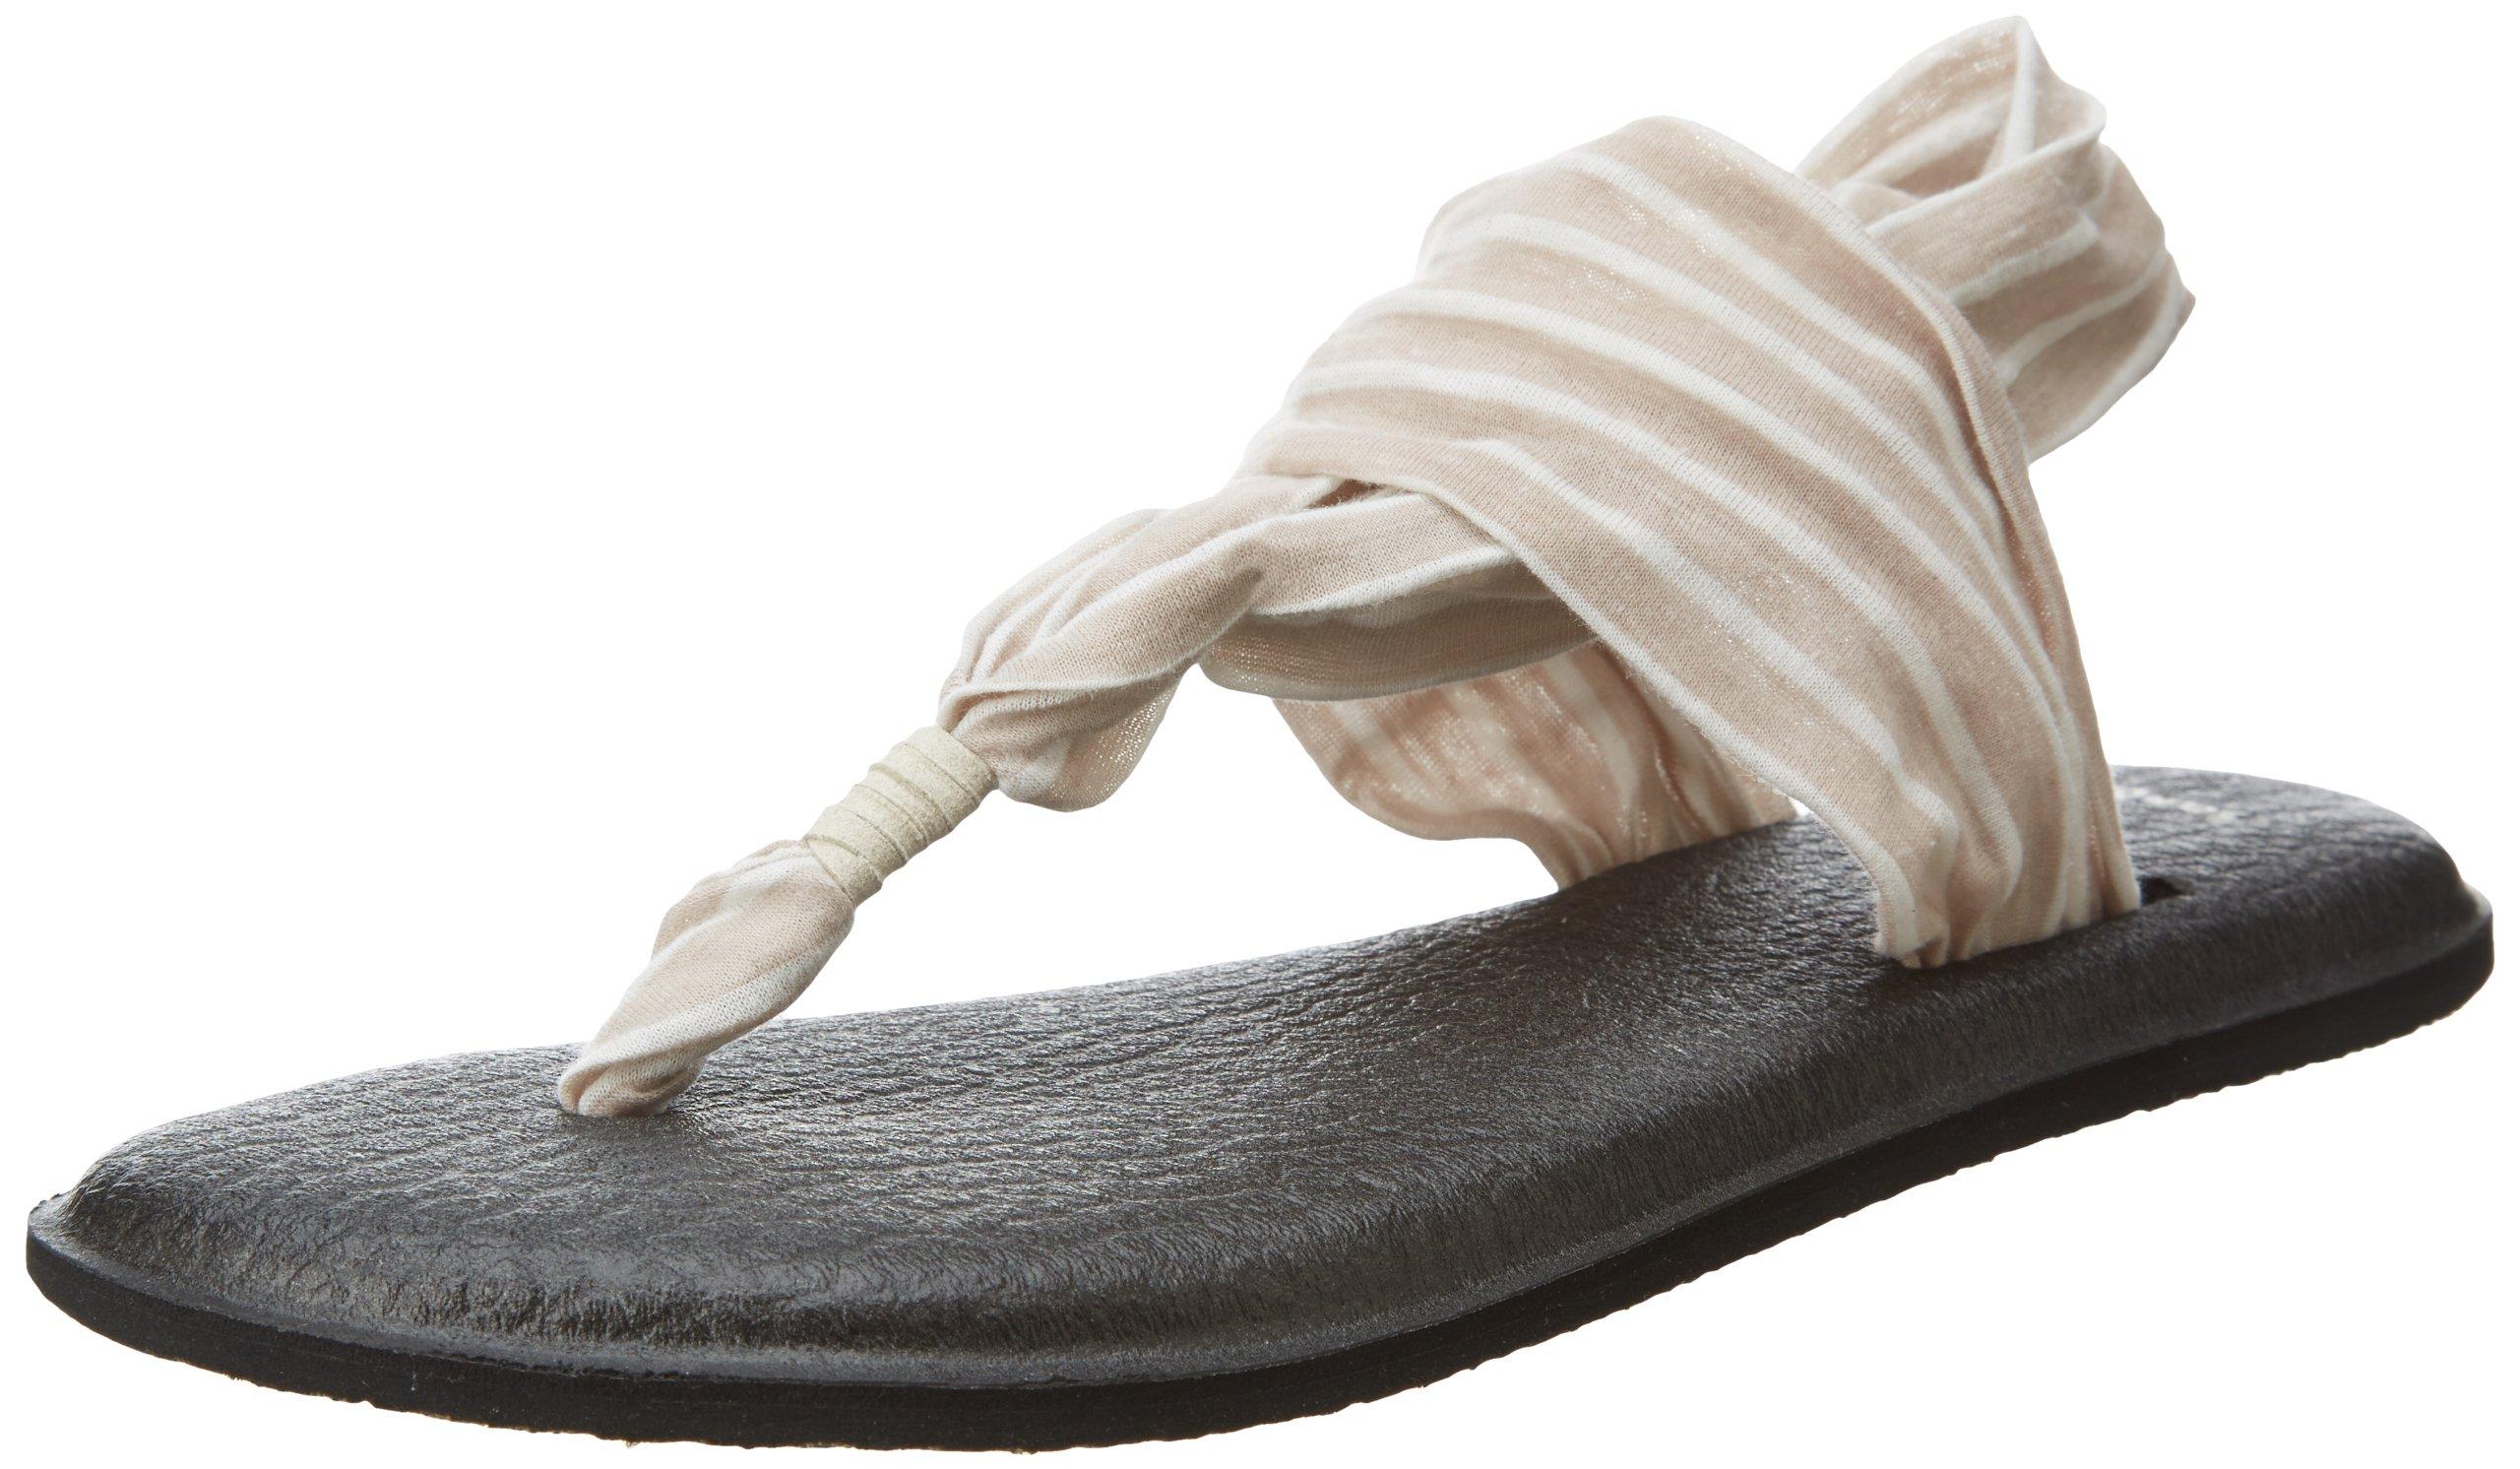 Sanuk Women's Yoga Sling 2 Prints Flip Flop,Tan/Natural Stripes,9 M US